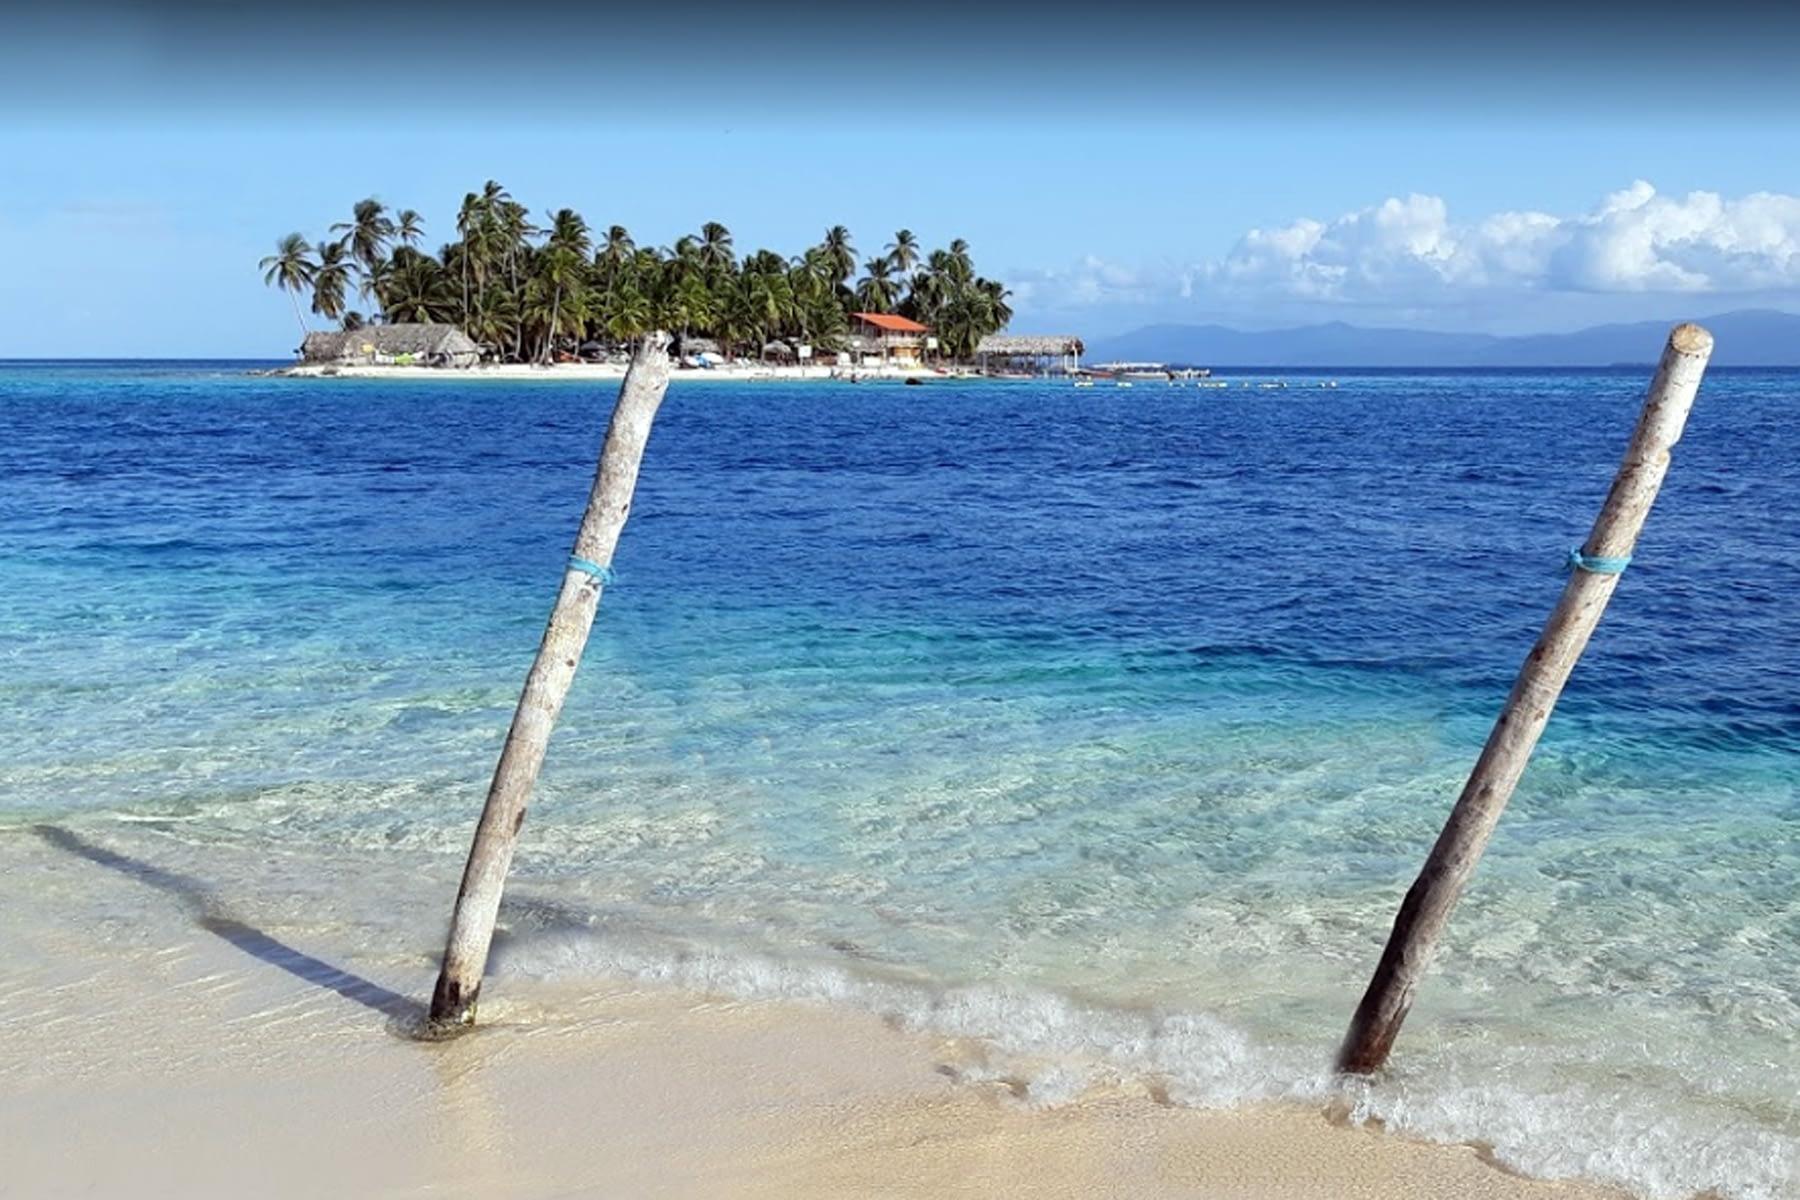 Playa en la isla Niadub